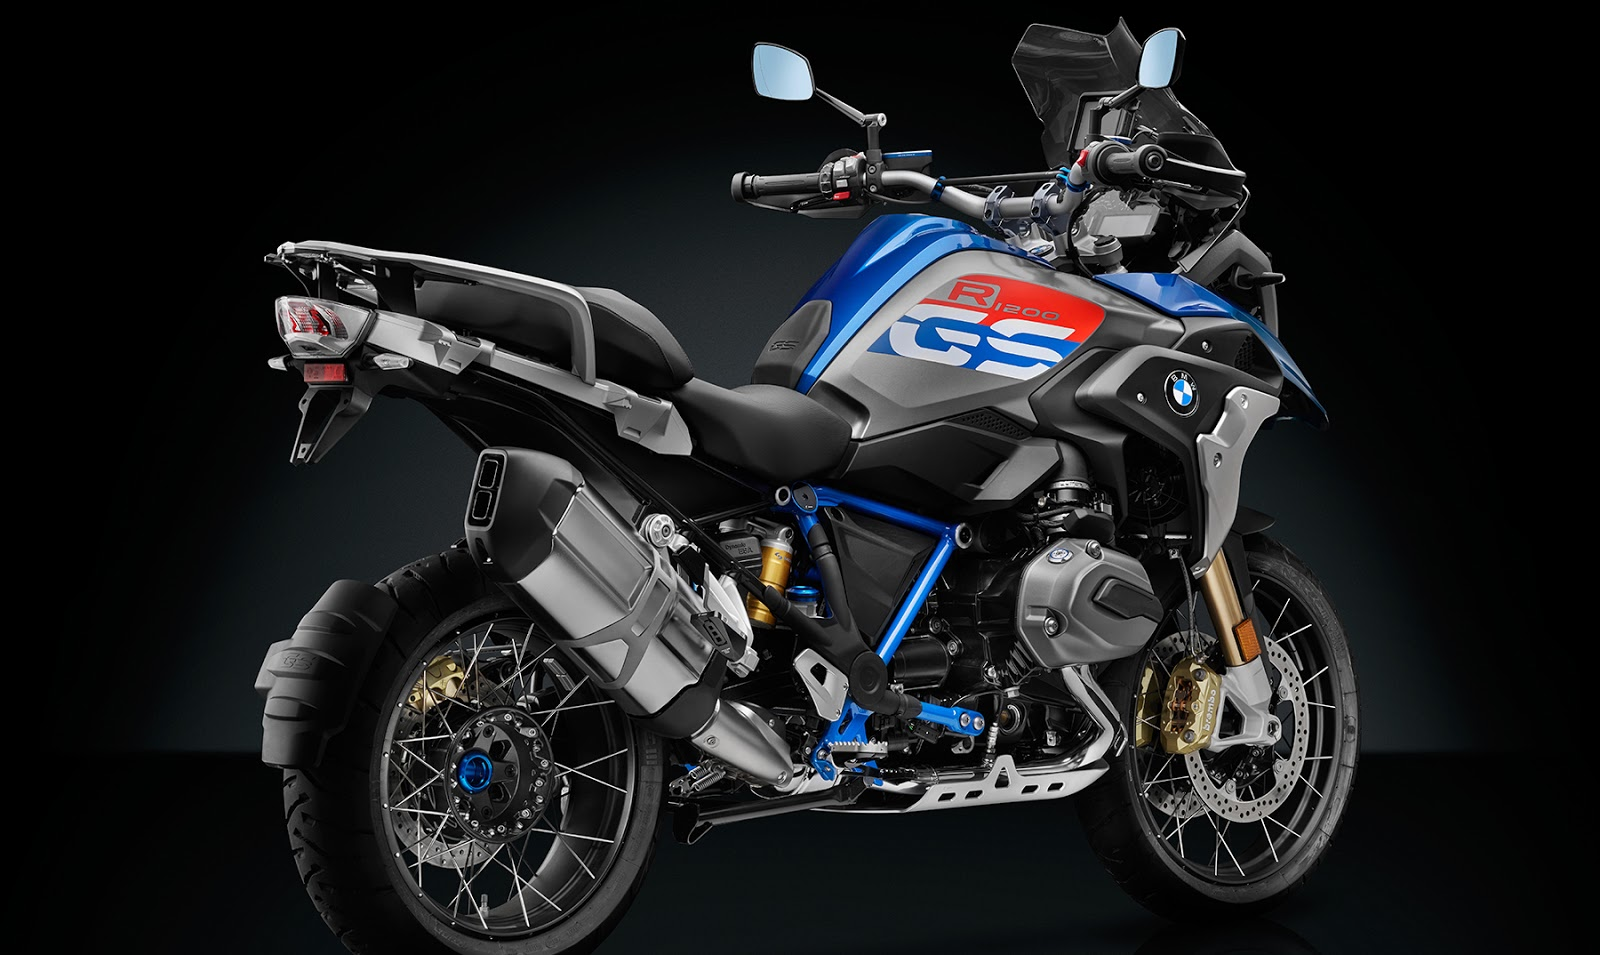 Rizoma pone en forma la BMW R 1200 GS - Fénix Moto